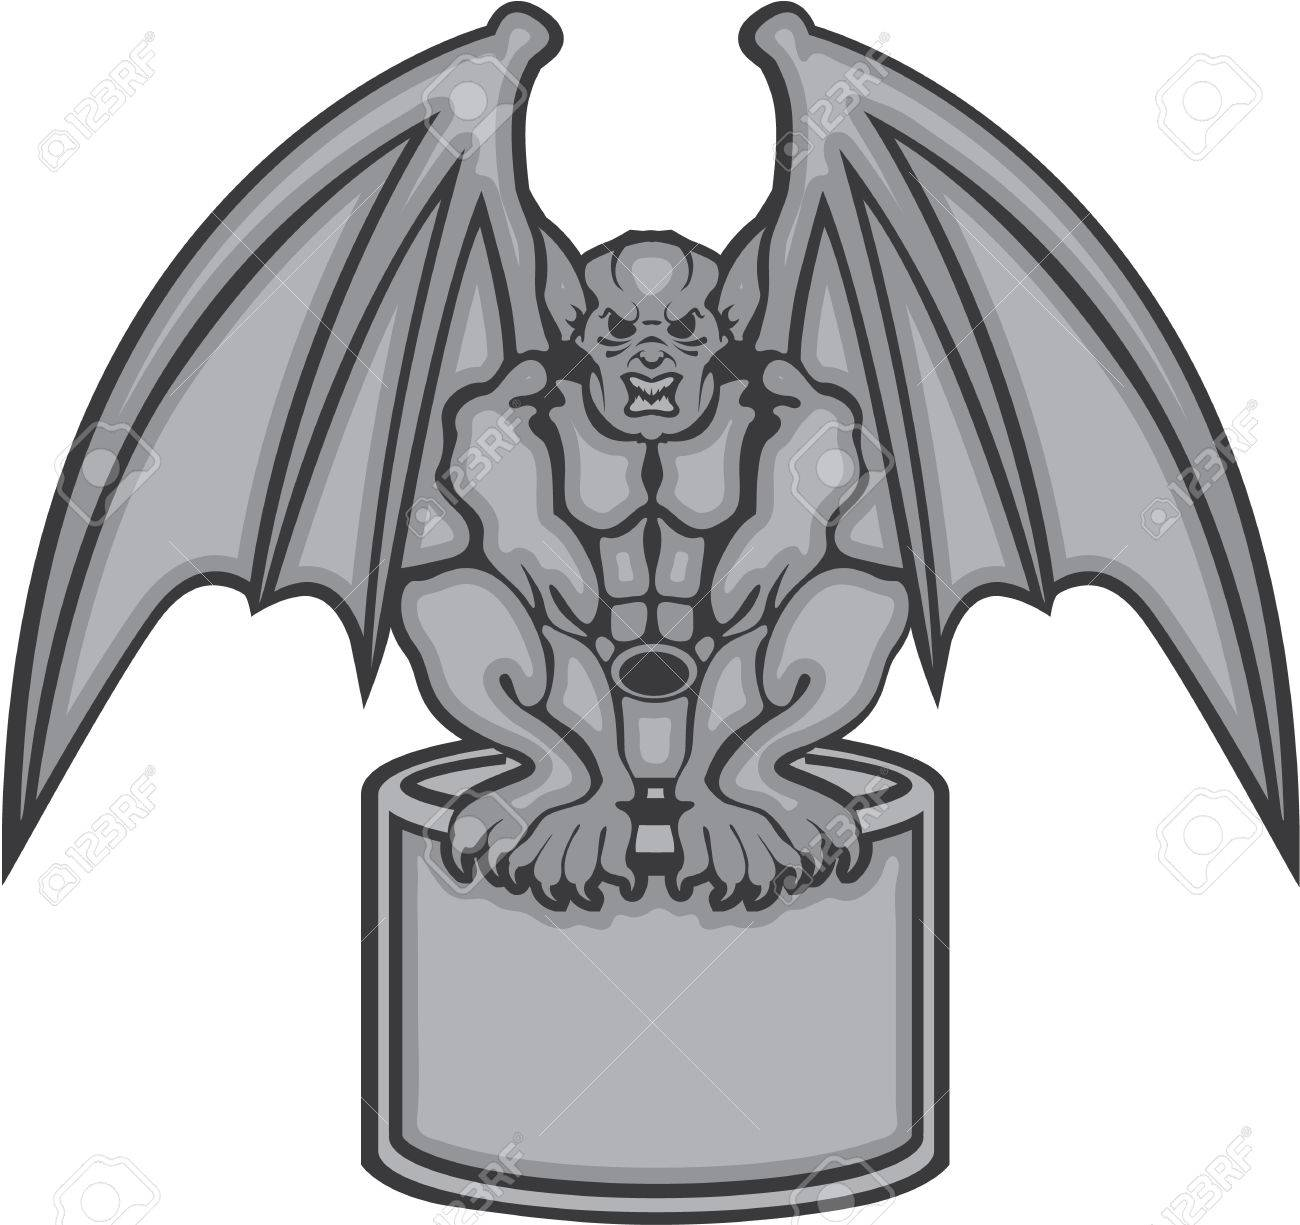 hight resolution of gargoyle stone statue vector illustration clip art stock vector 68043974